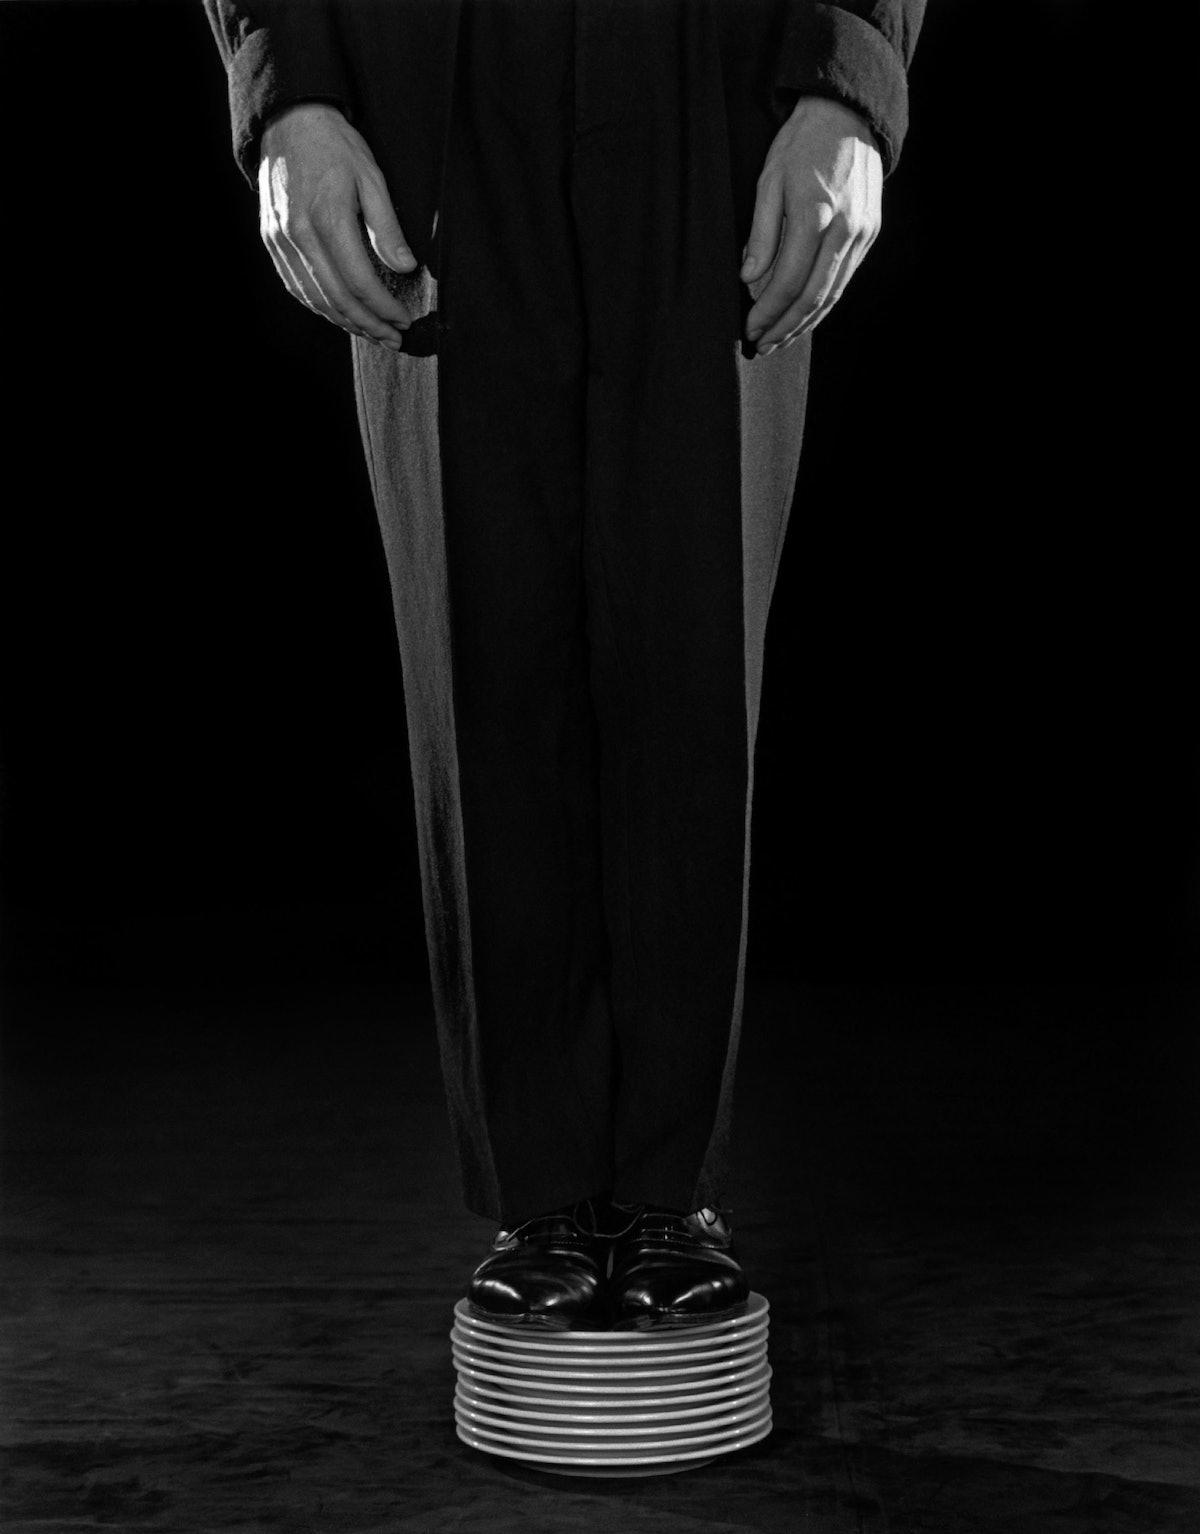 Robert Mapplethorpe, Shoes on Plates, 1984.jpg